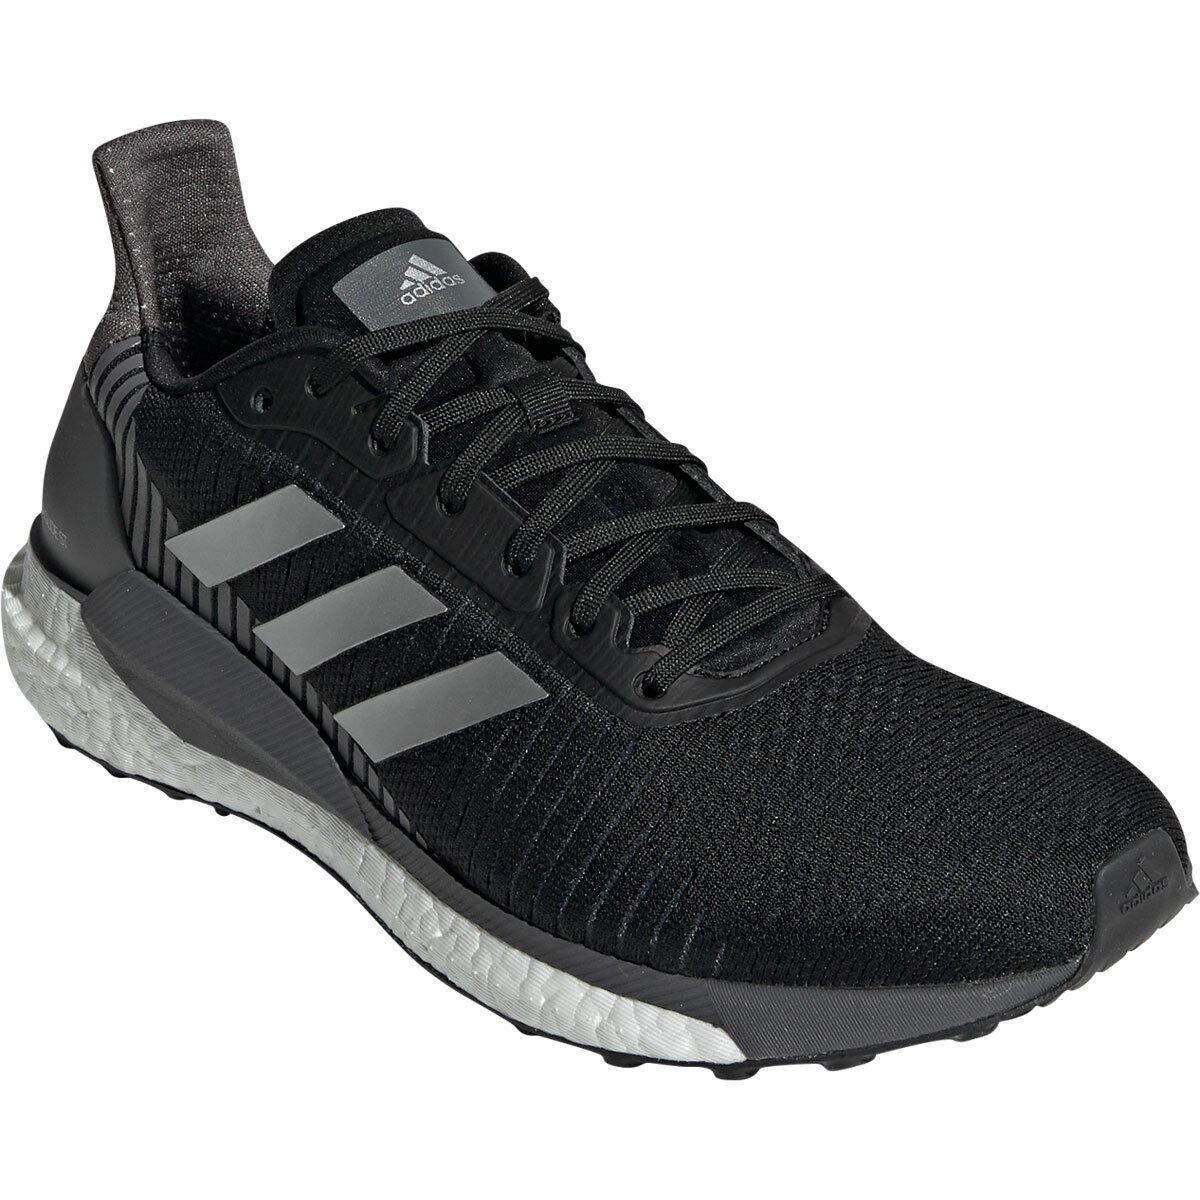 Adidas SOLAR GLIDE ST (Boost) Men   EF1467 Laufschuhe   schwarz Silber met. grau